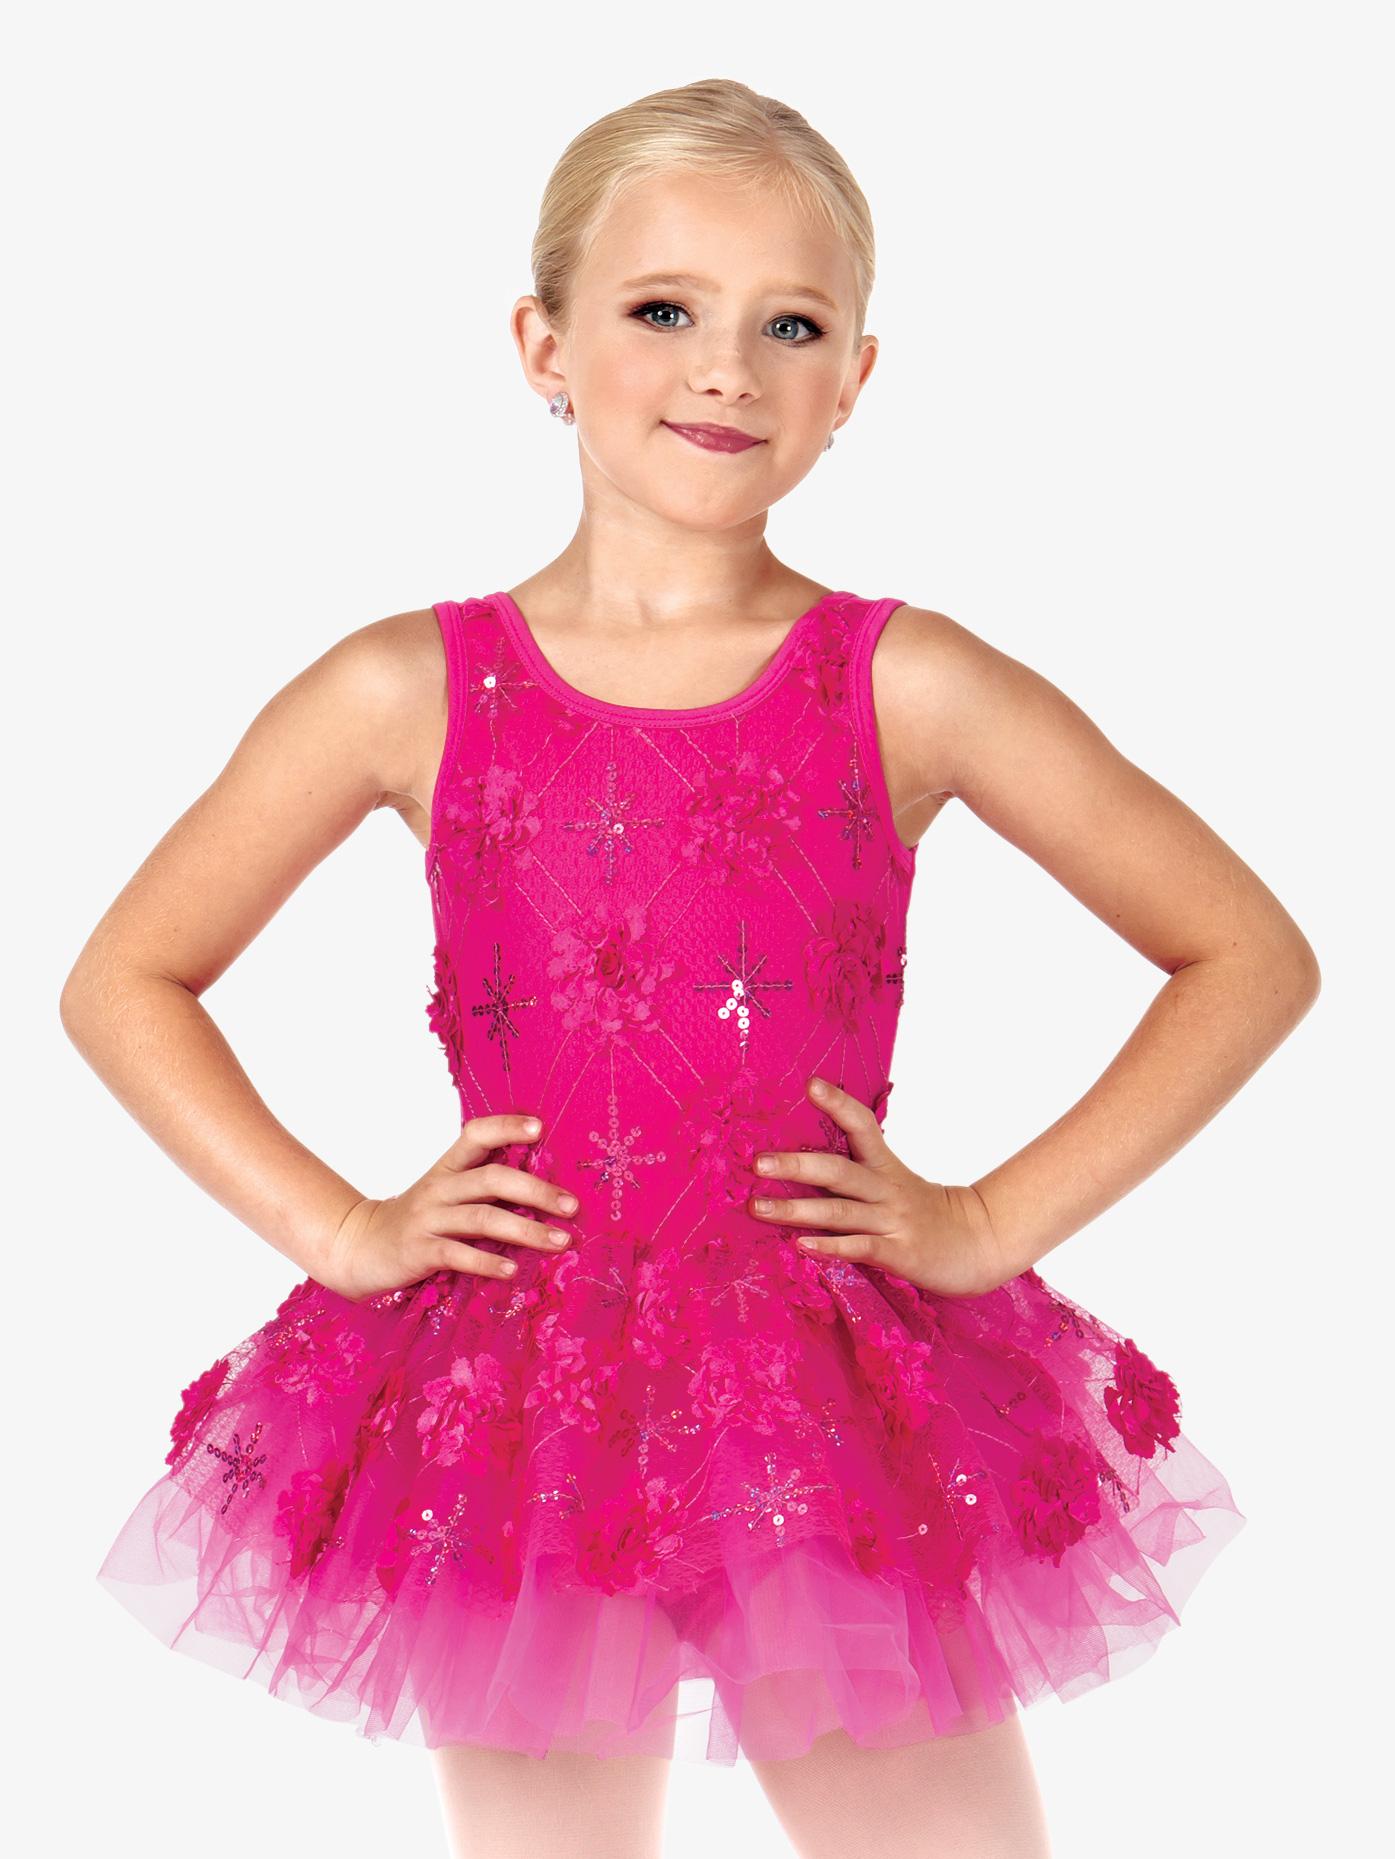 La Petite Ballerina Child Flower Applique Tank Tutu Costume Dress PB2008C